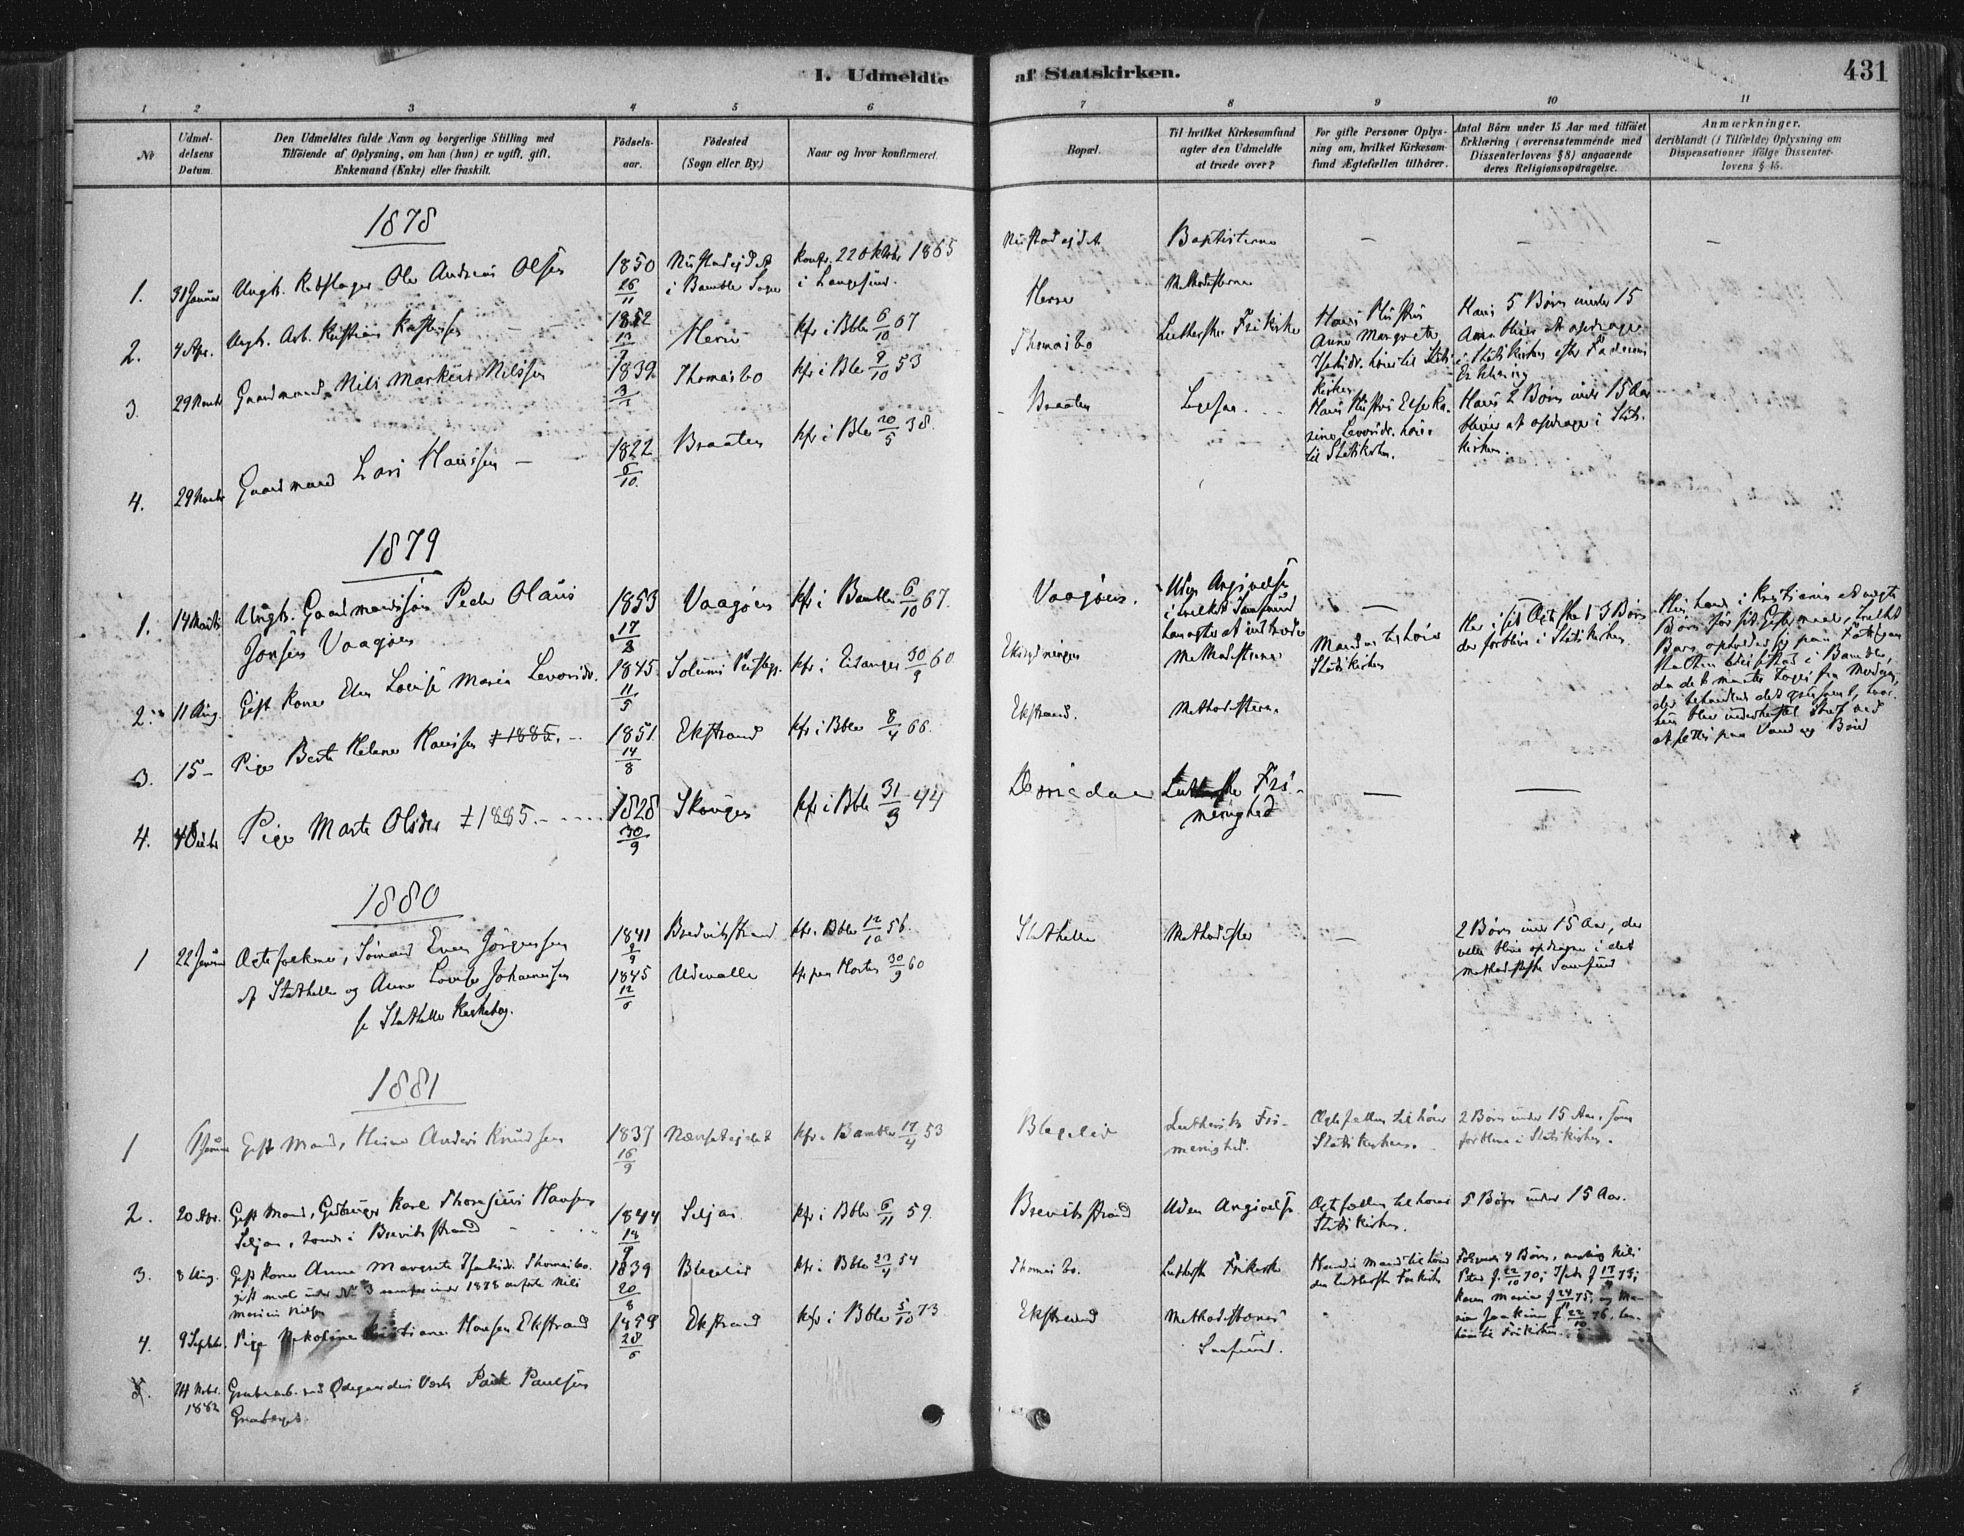 SAKO, Bamble kirkebøker, F/Fa/L0007: Ministerialbok nr. I 7, 1878-1888, s. 431